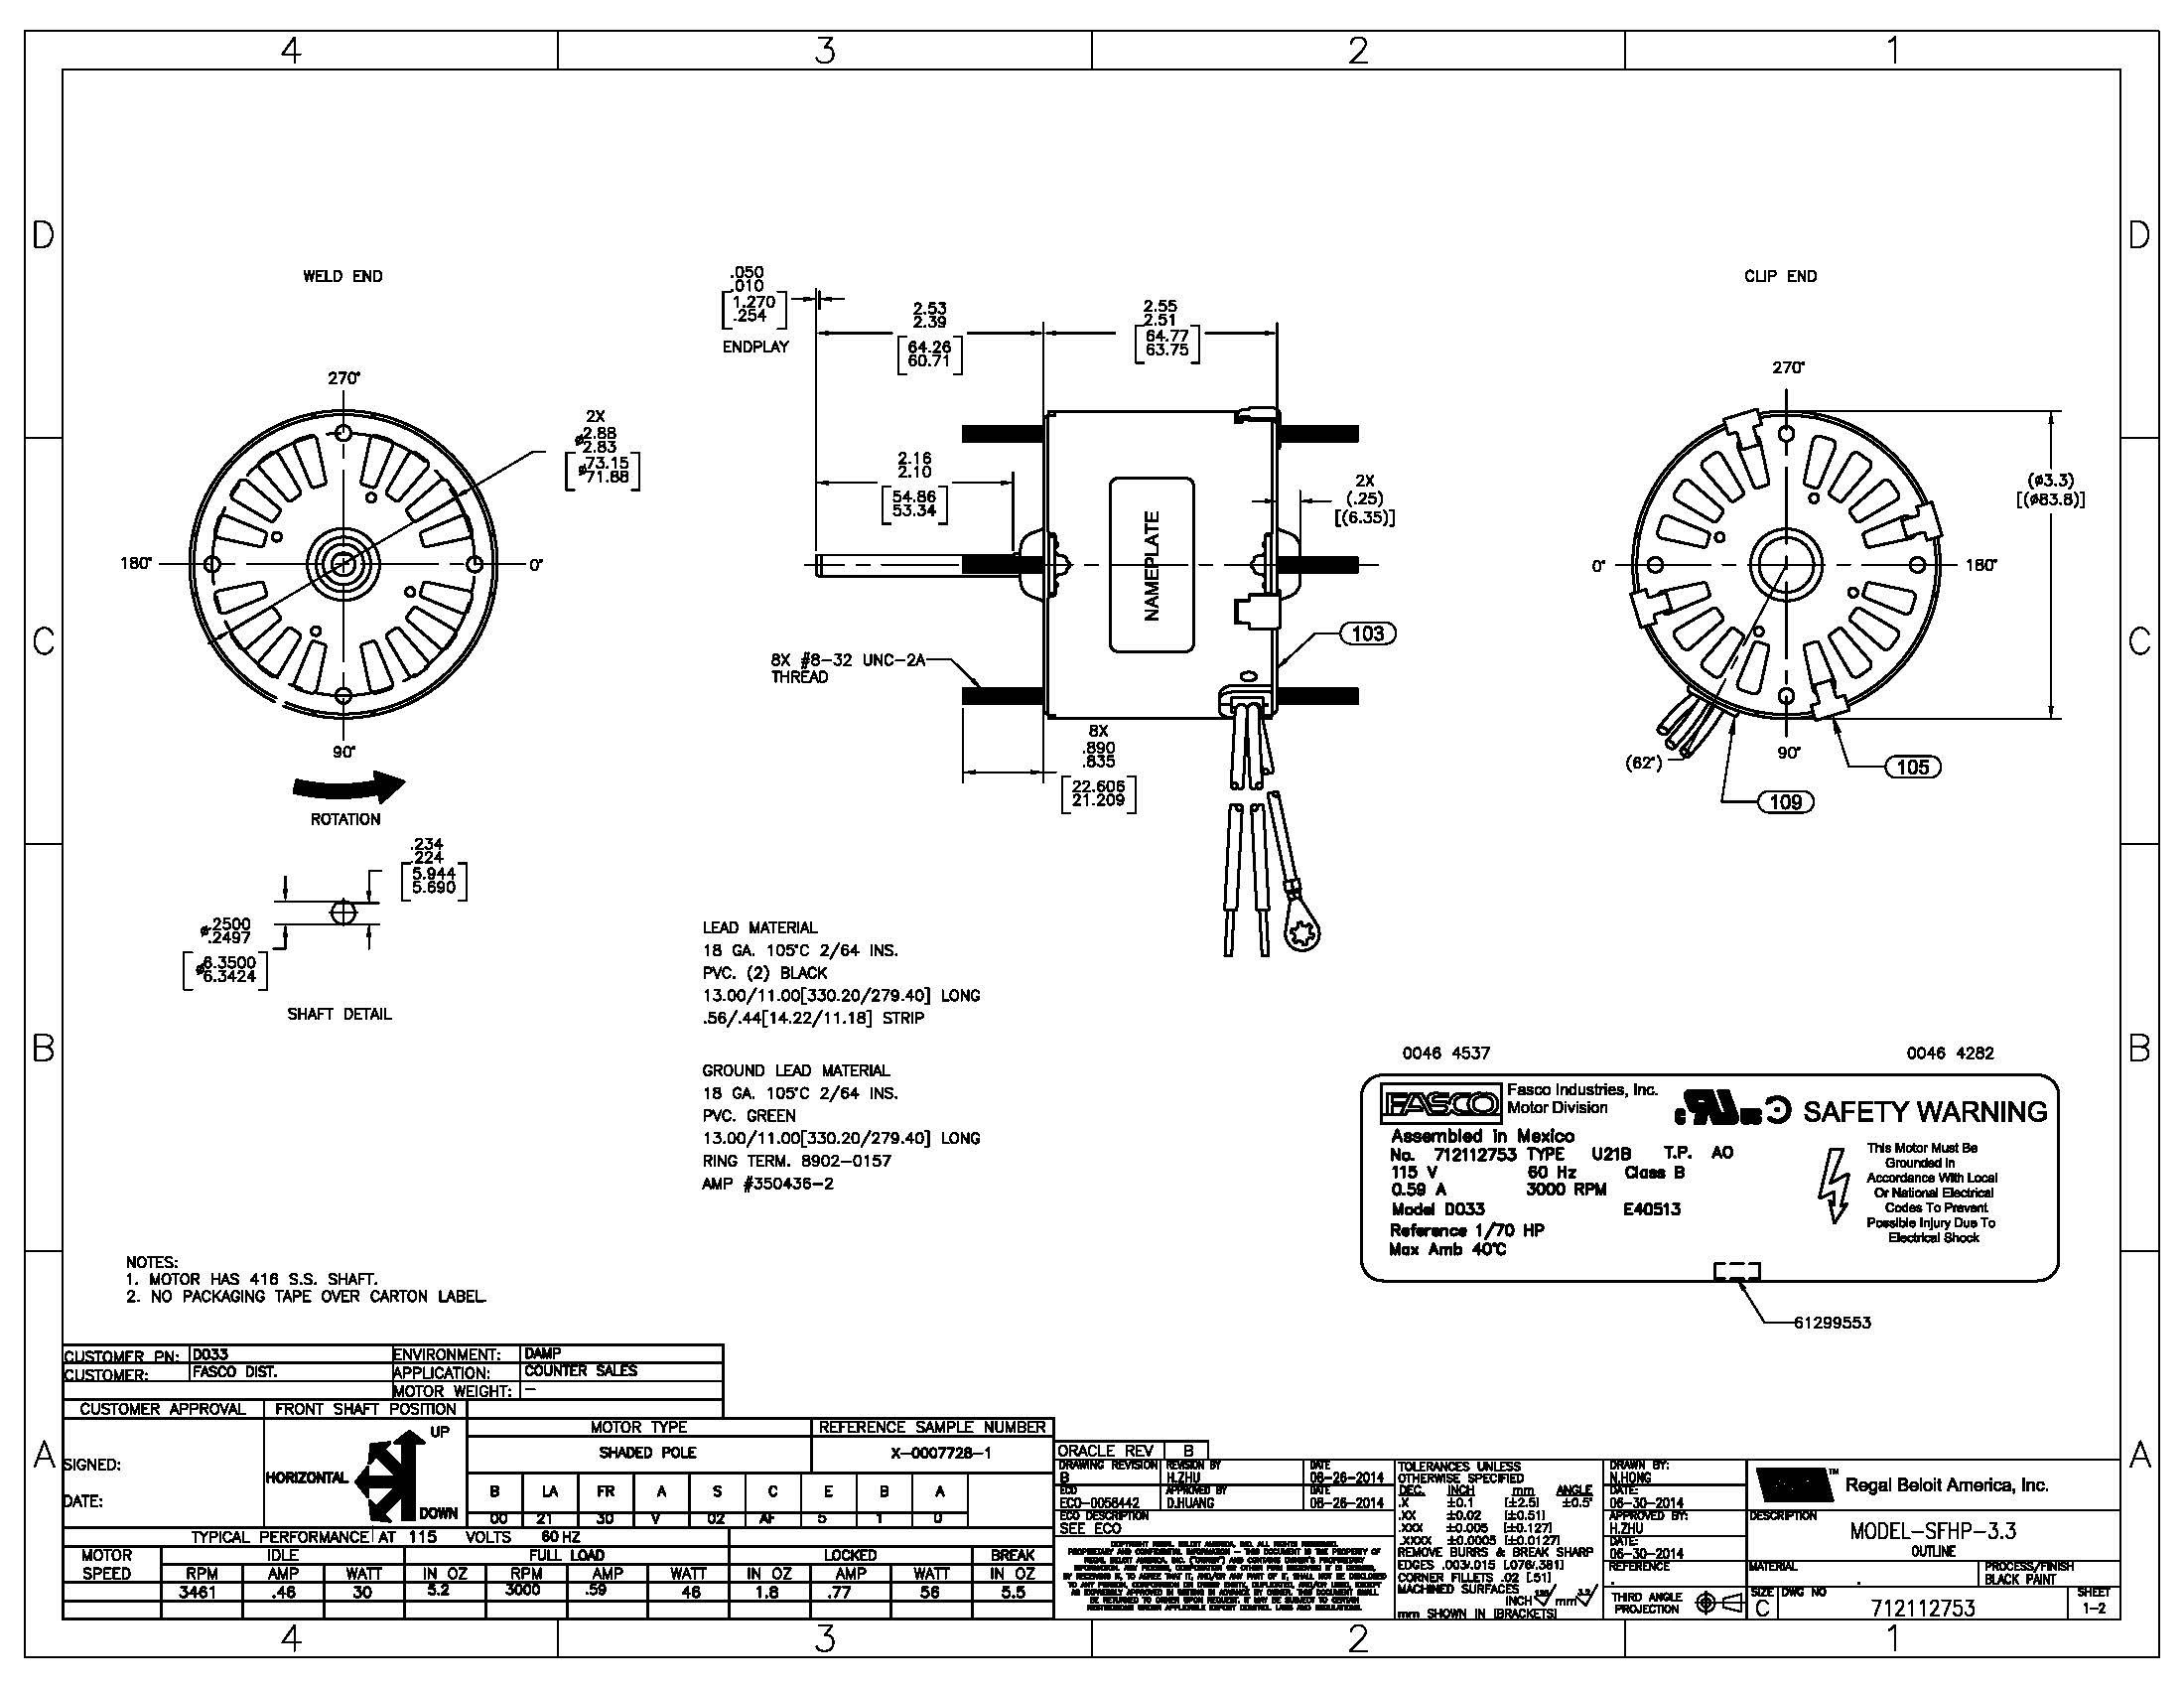 Ac fan motor capacitor wiring diagram